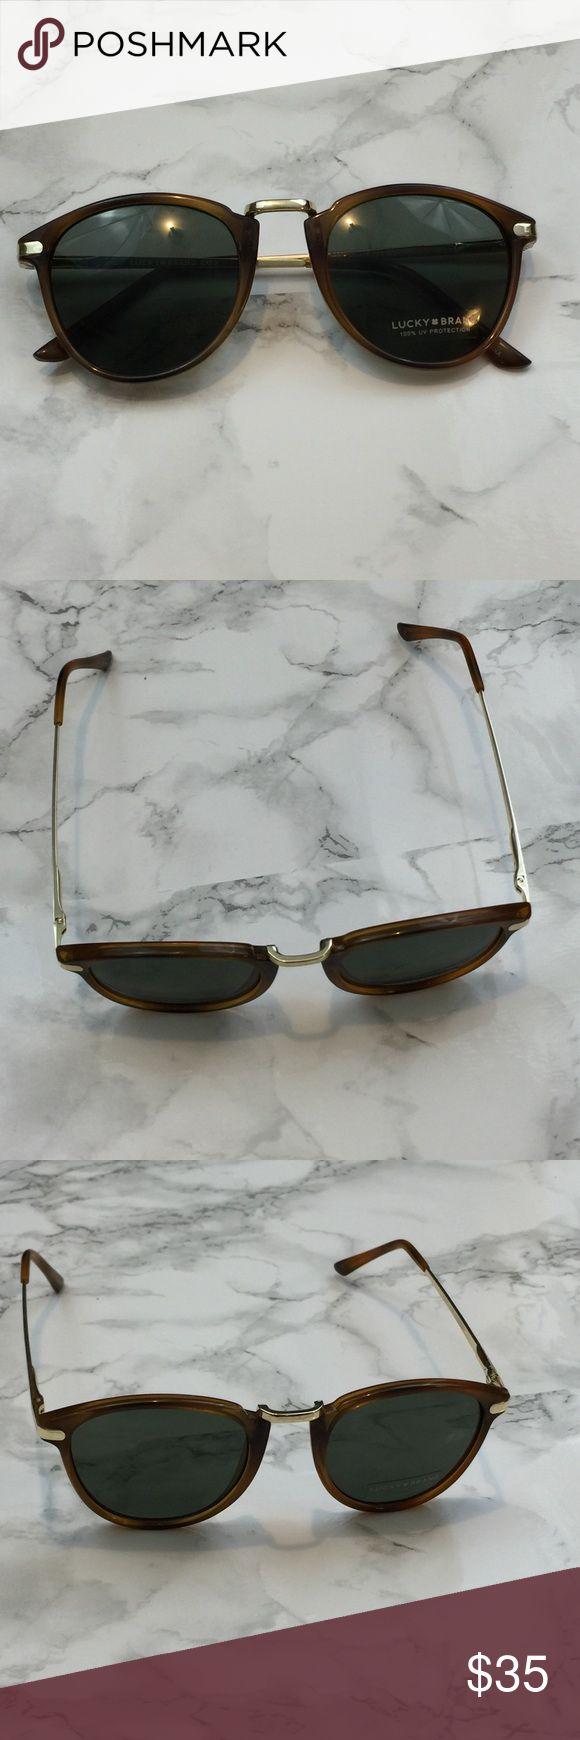 Lucky Brand Retro Women's Sunglasses Beautiful sunglasses, see pictures for details Lucky Brand Accessories Sunglasses